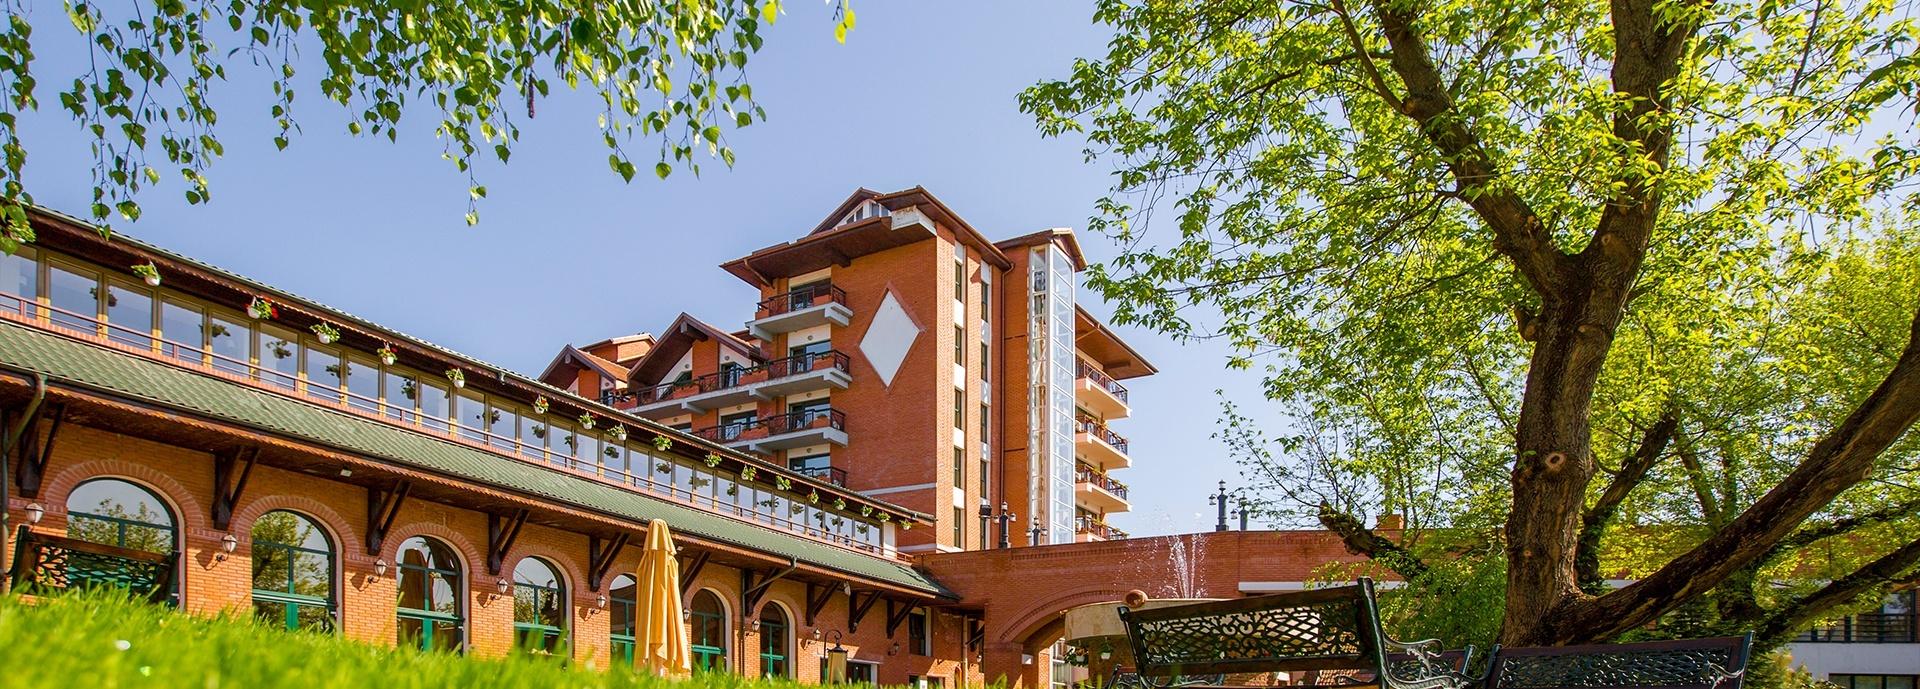 Hotel Caro - Apartament in vila